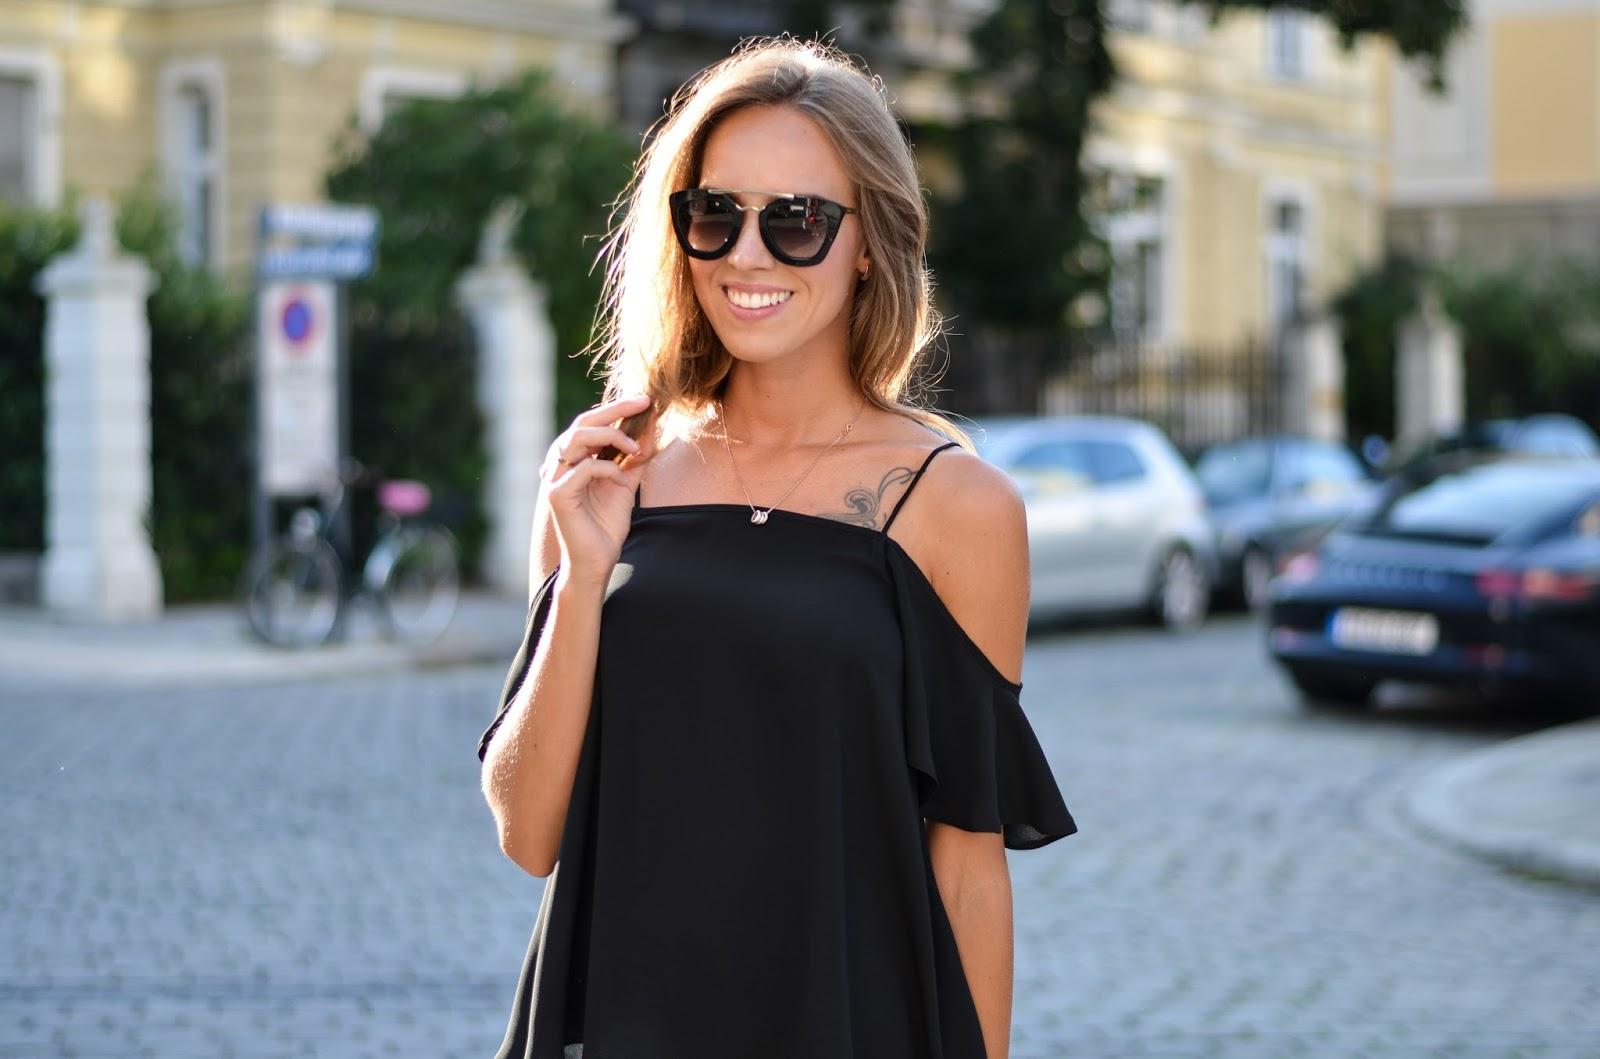 kristjaana mere black asos off shoulder top prada sunglasses summer outfit